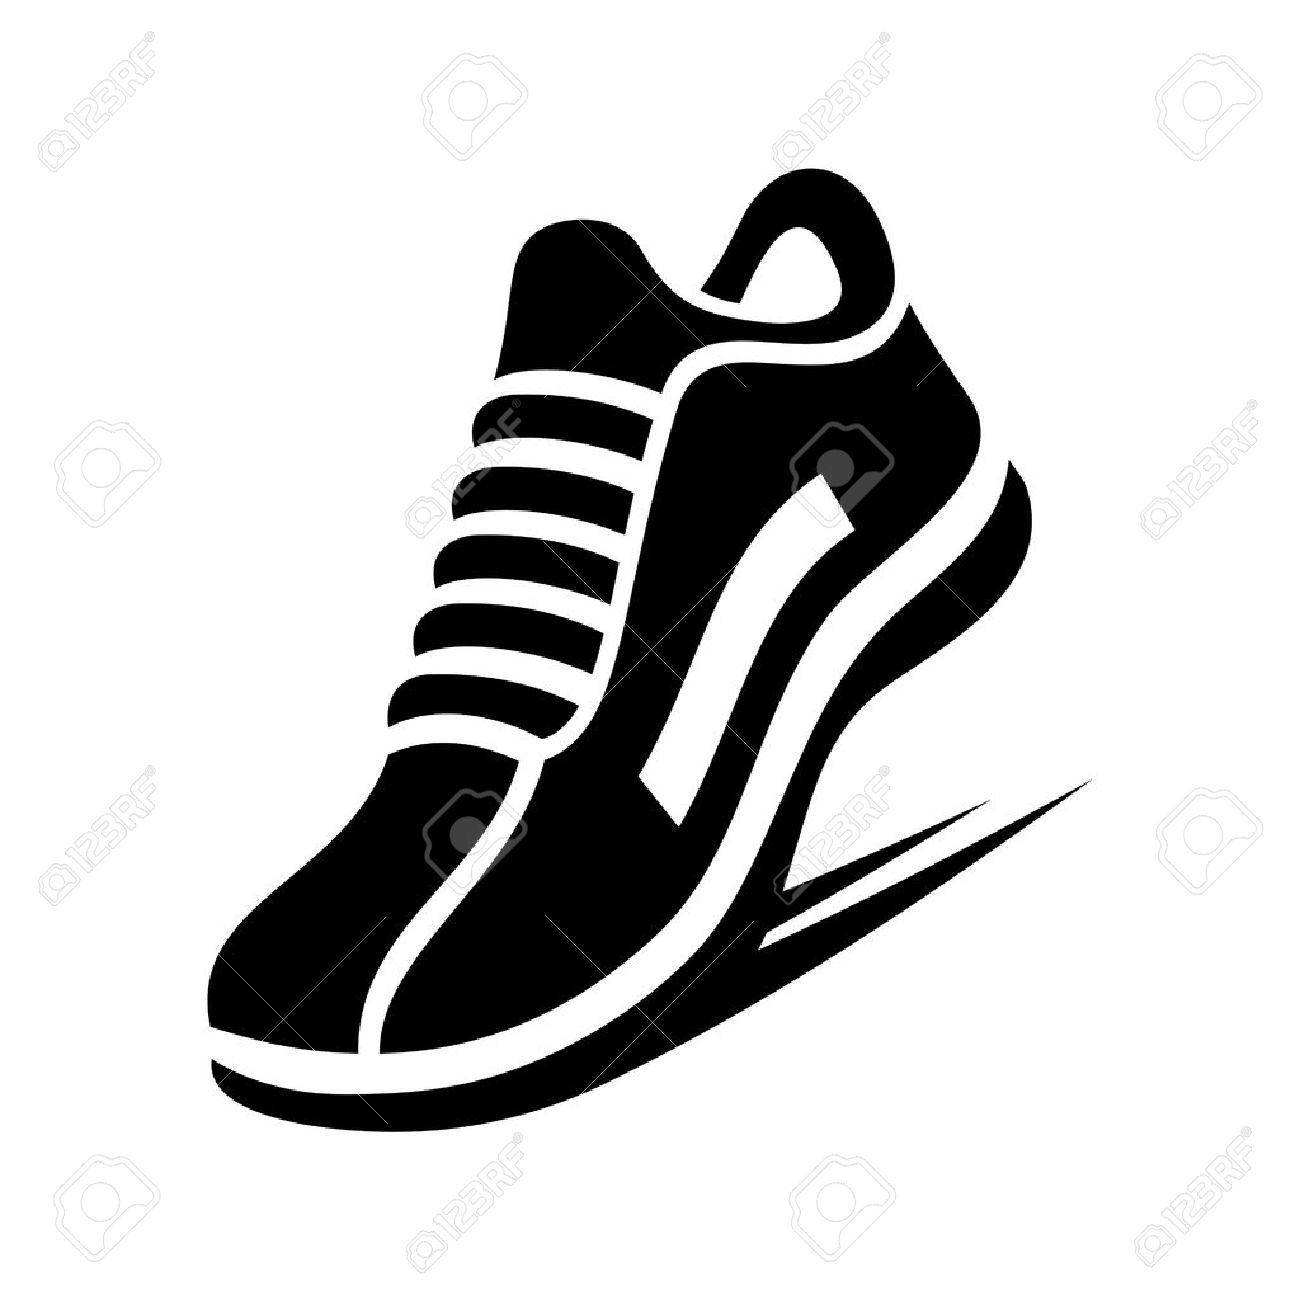 680 Running Shoe free clipart.